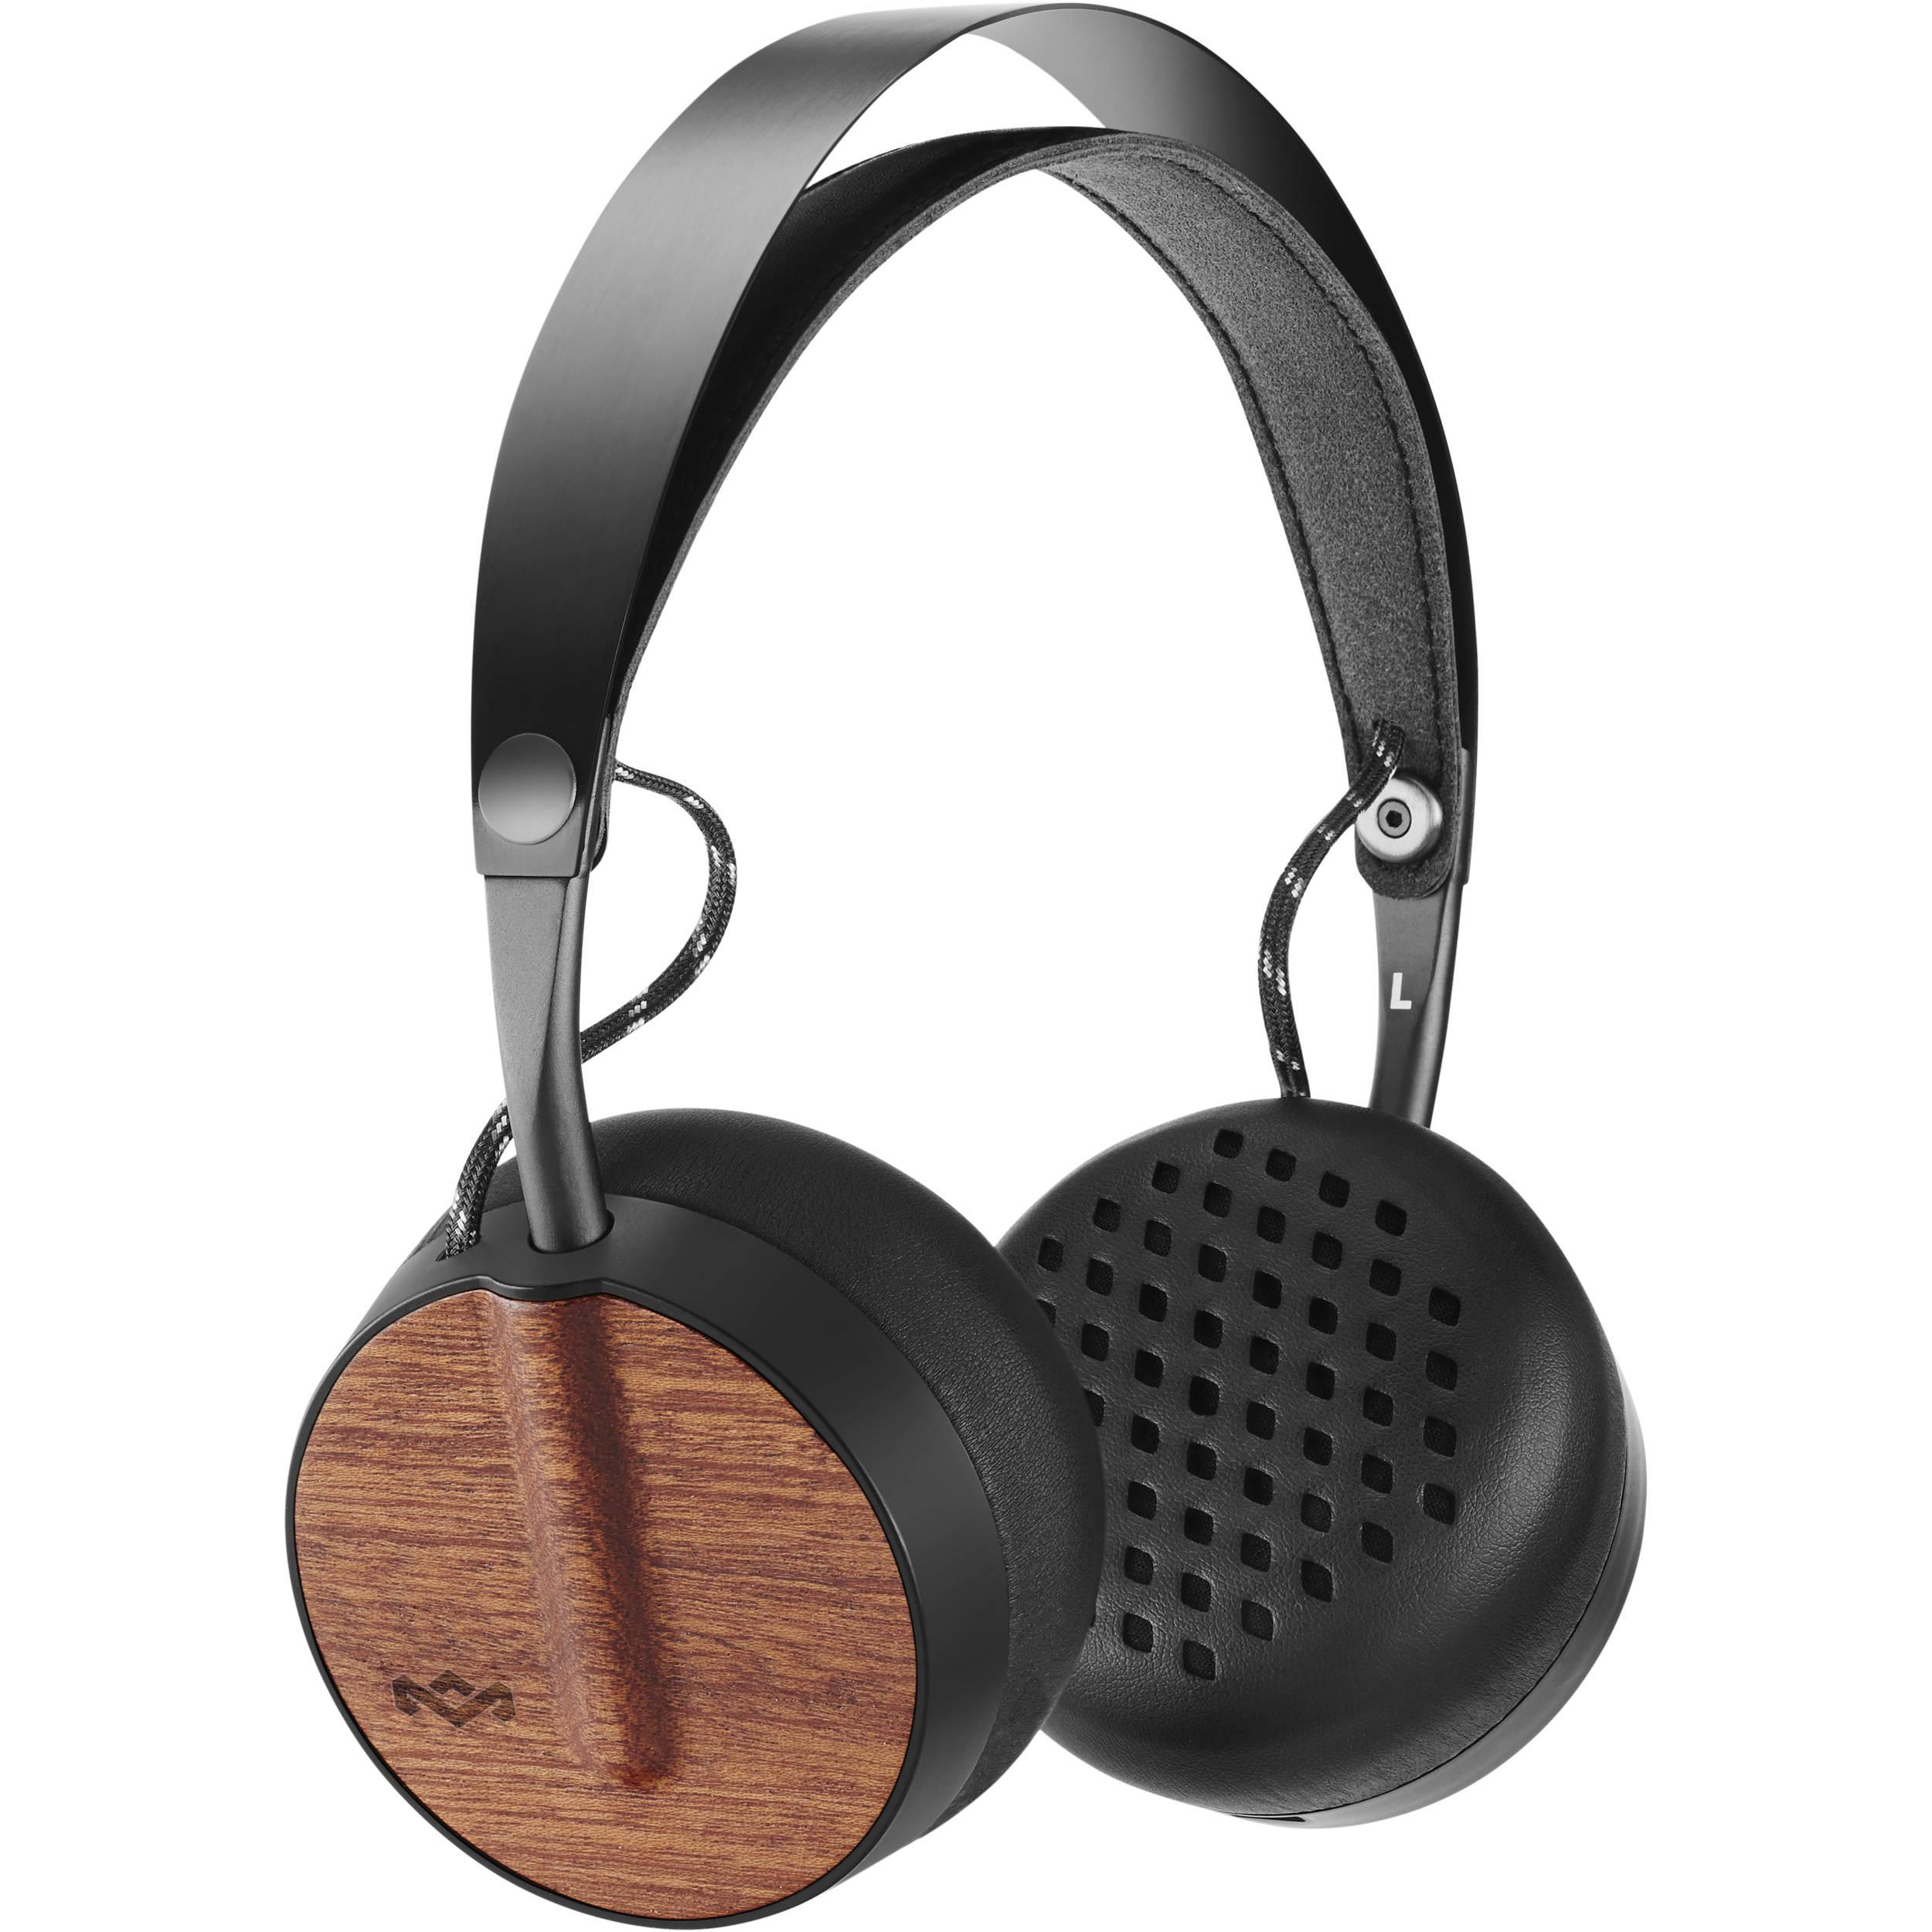 Wireless bluetooth headphones marley - headphones bluetooth wireless mic